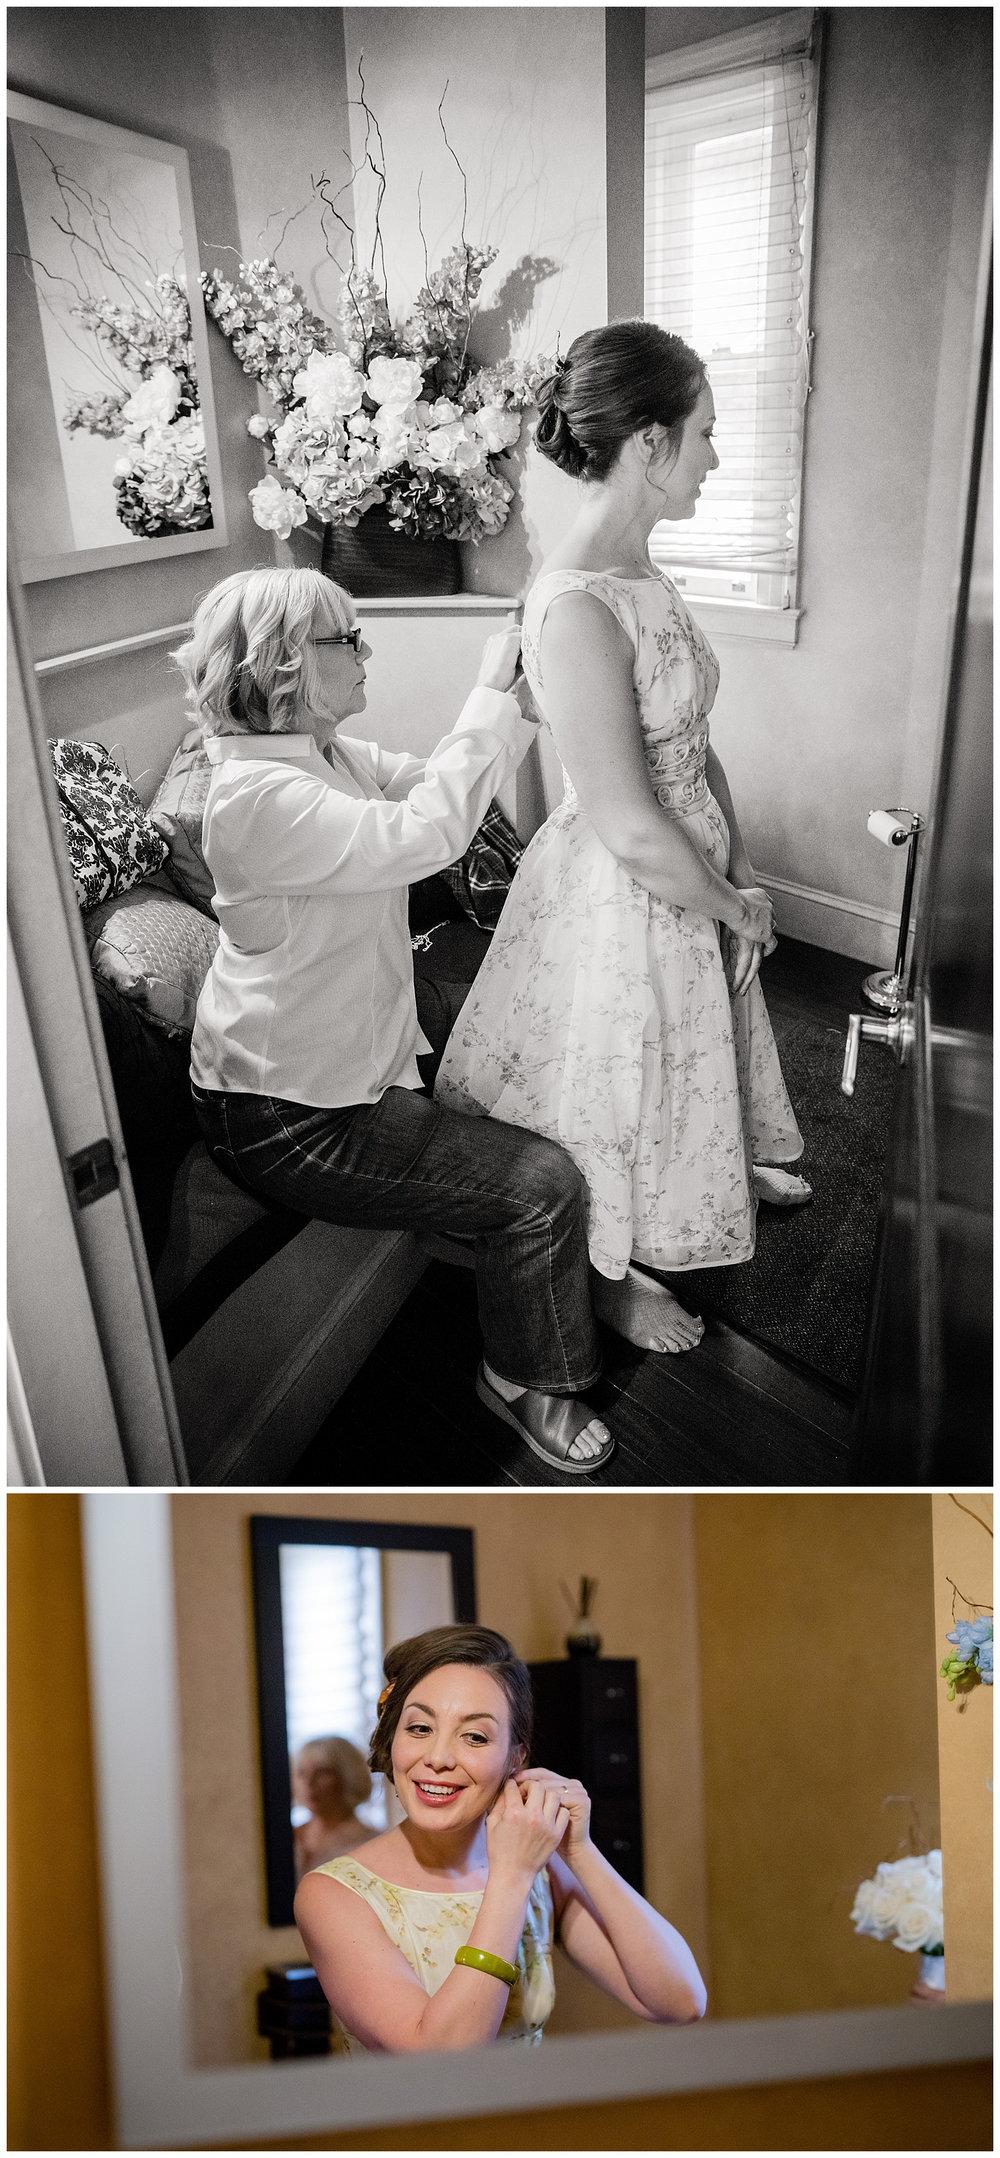 Lynn-Musuem-Wedding-Boston-Photographer-26-North-Studios-002.jpg